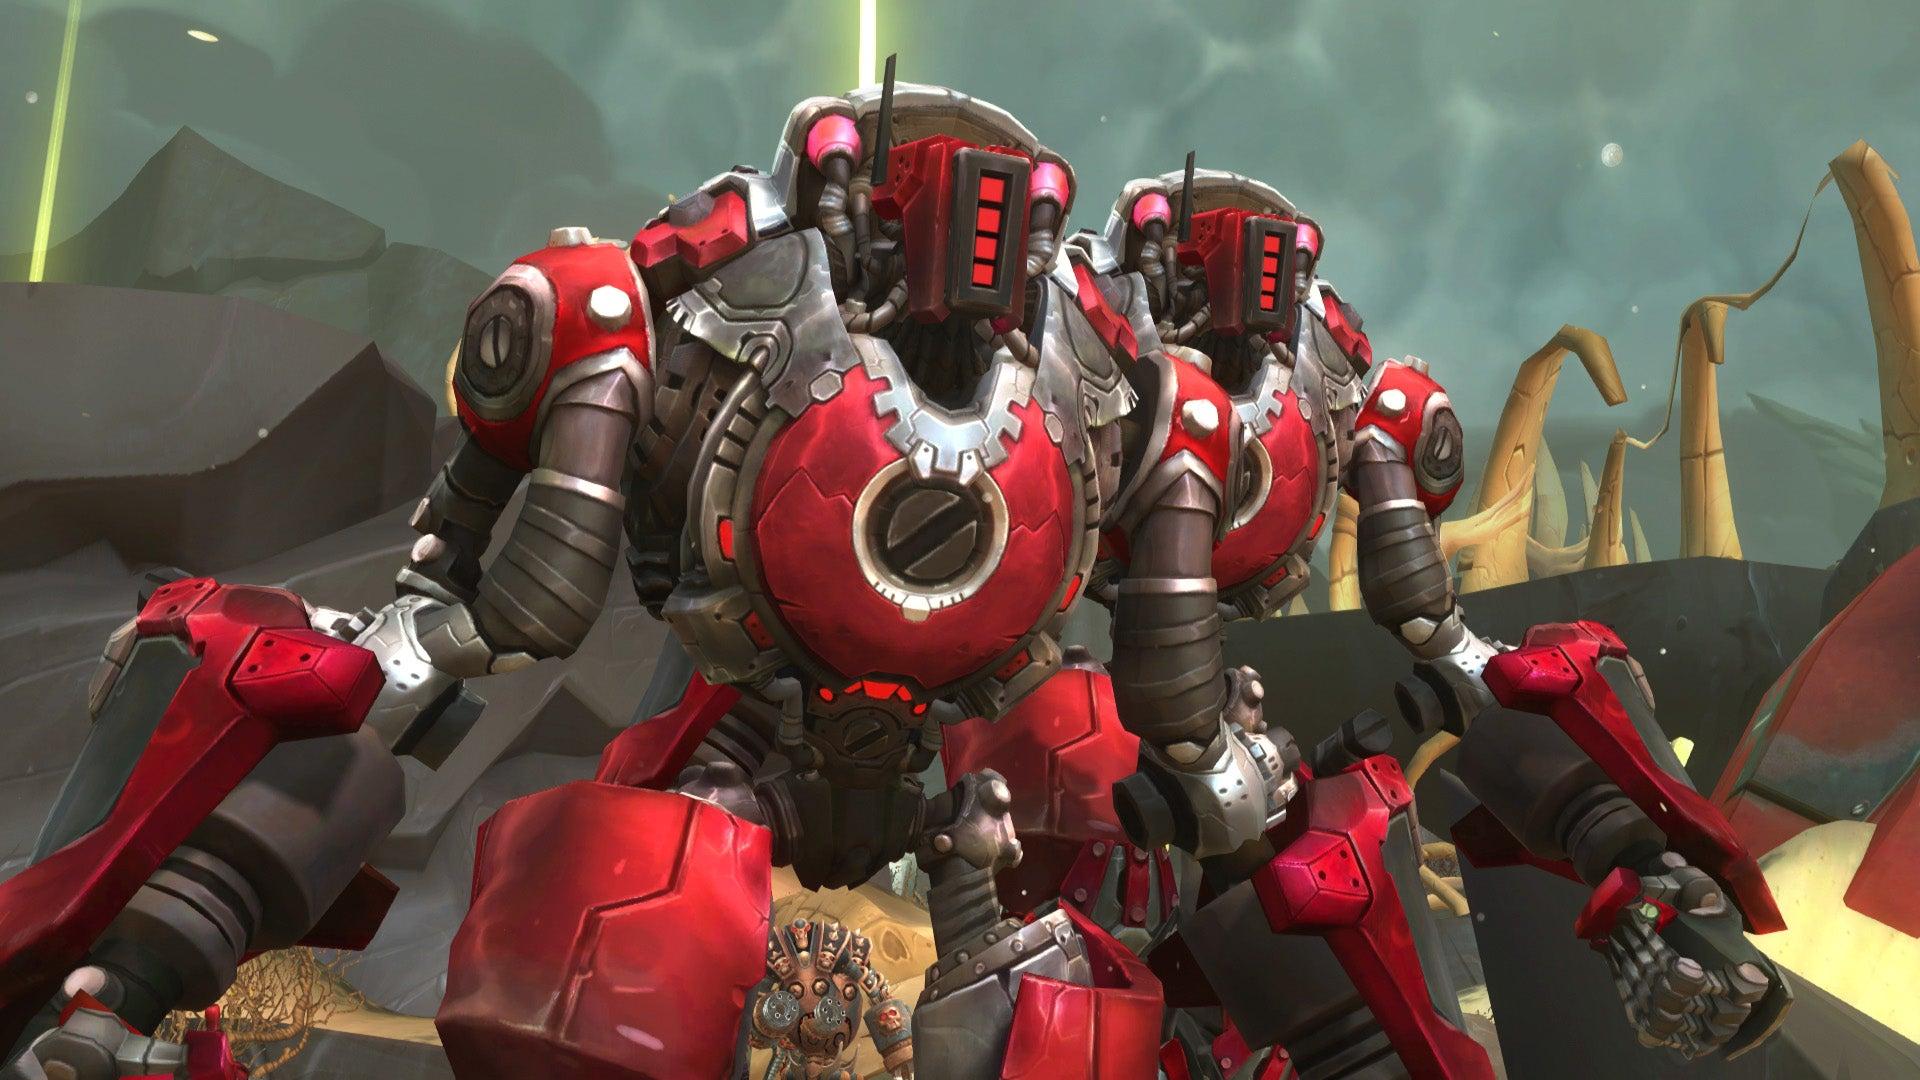 WildStar's Competitive Endgame Combines Design With Destruction